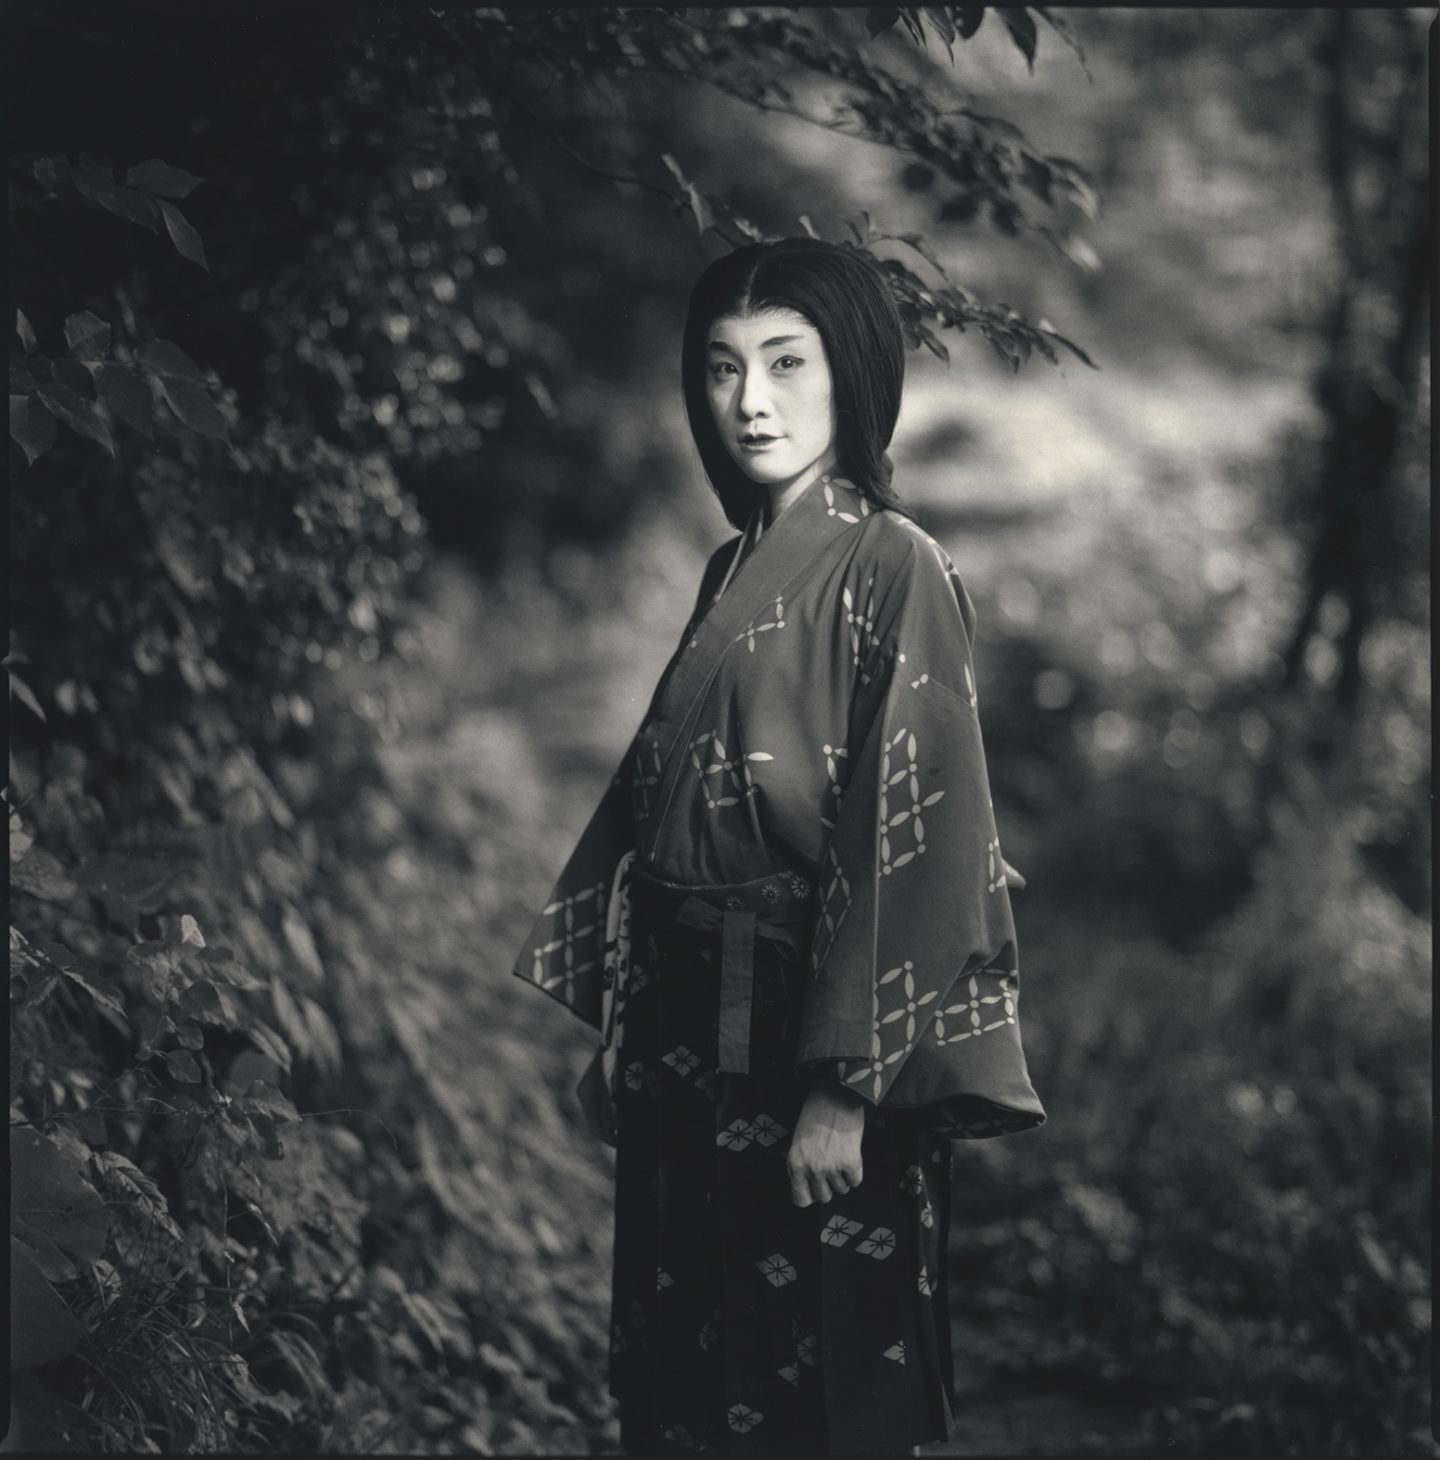 IGNANT-Photography-Hiroshi-Watanabe-Kwaidan-02